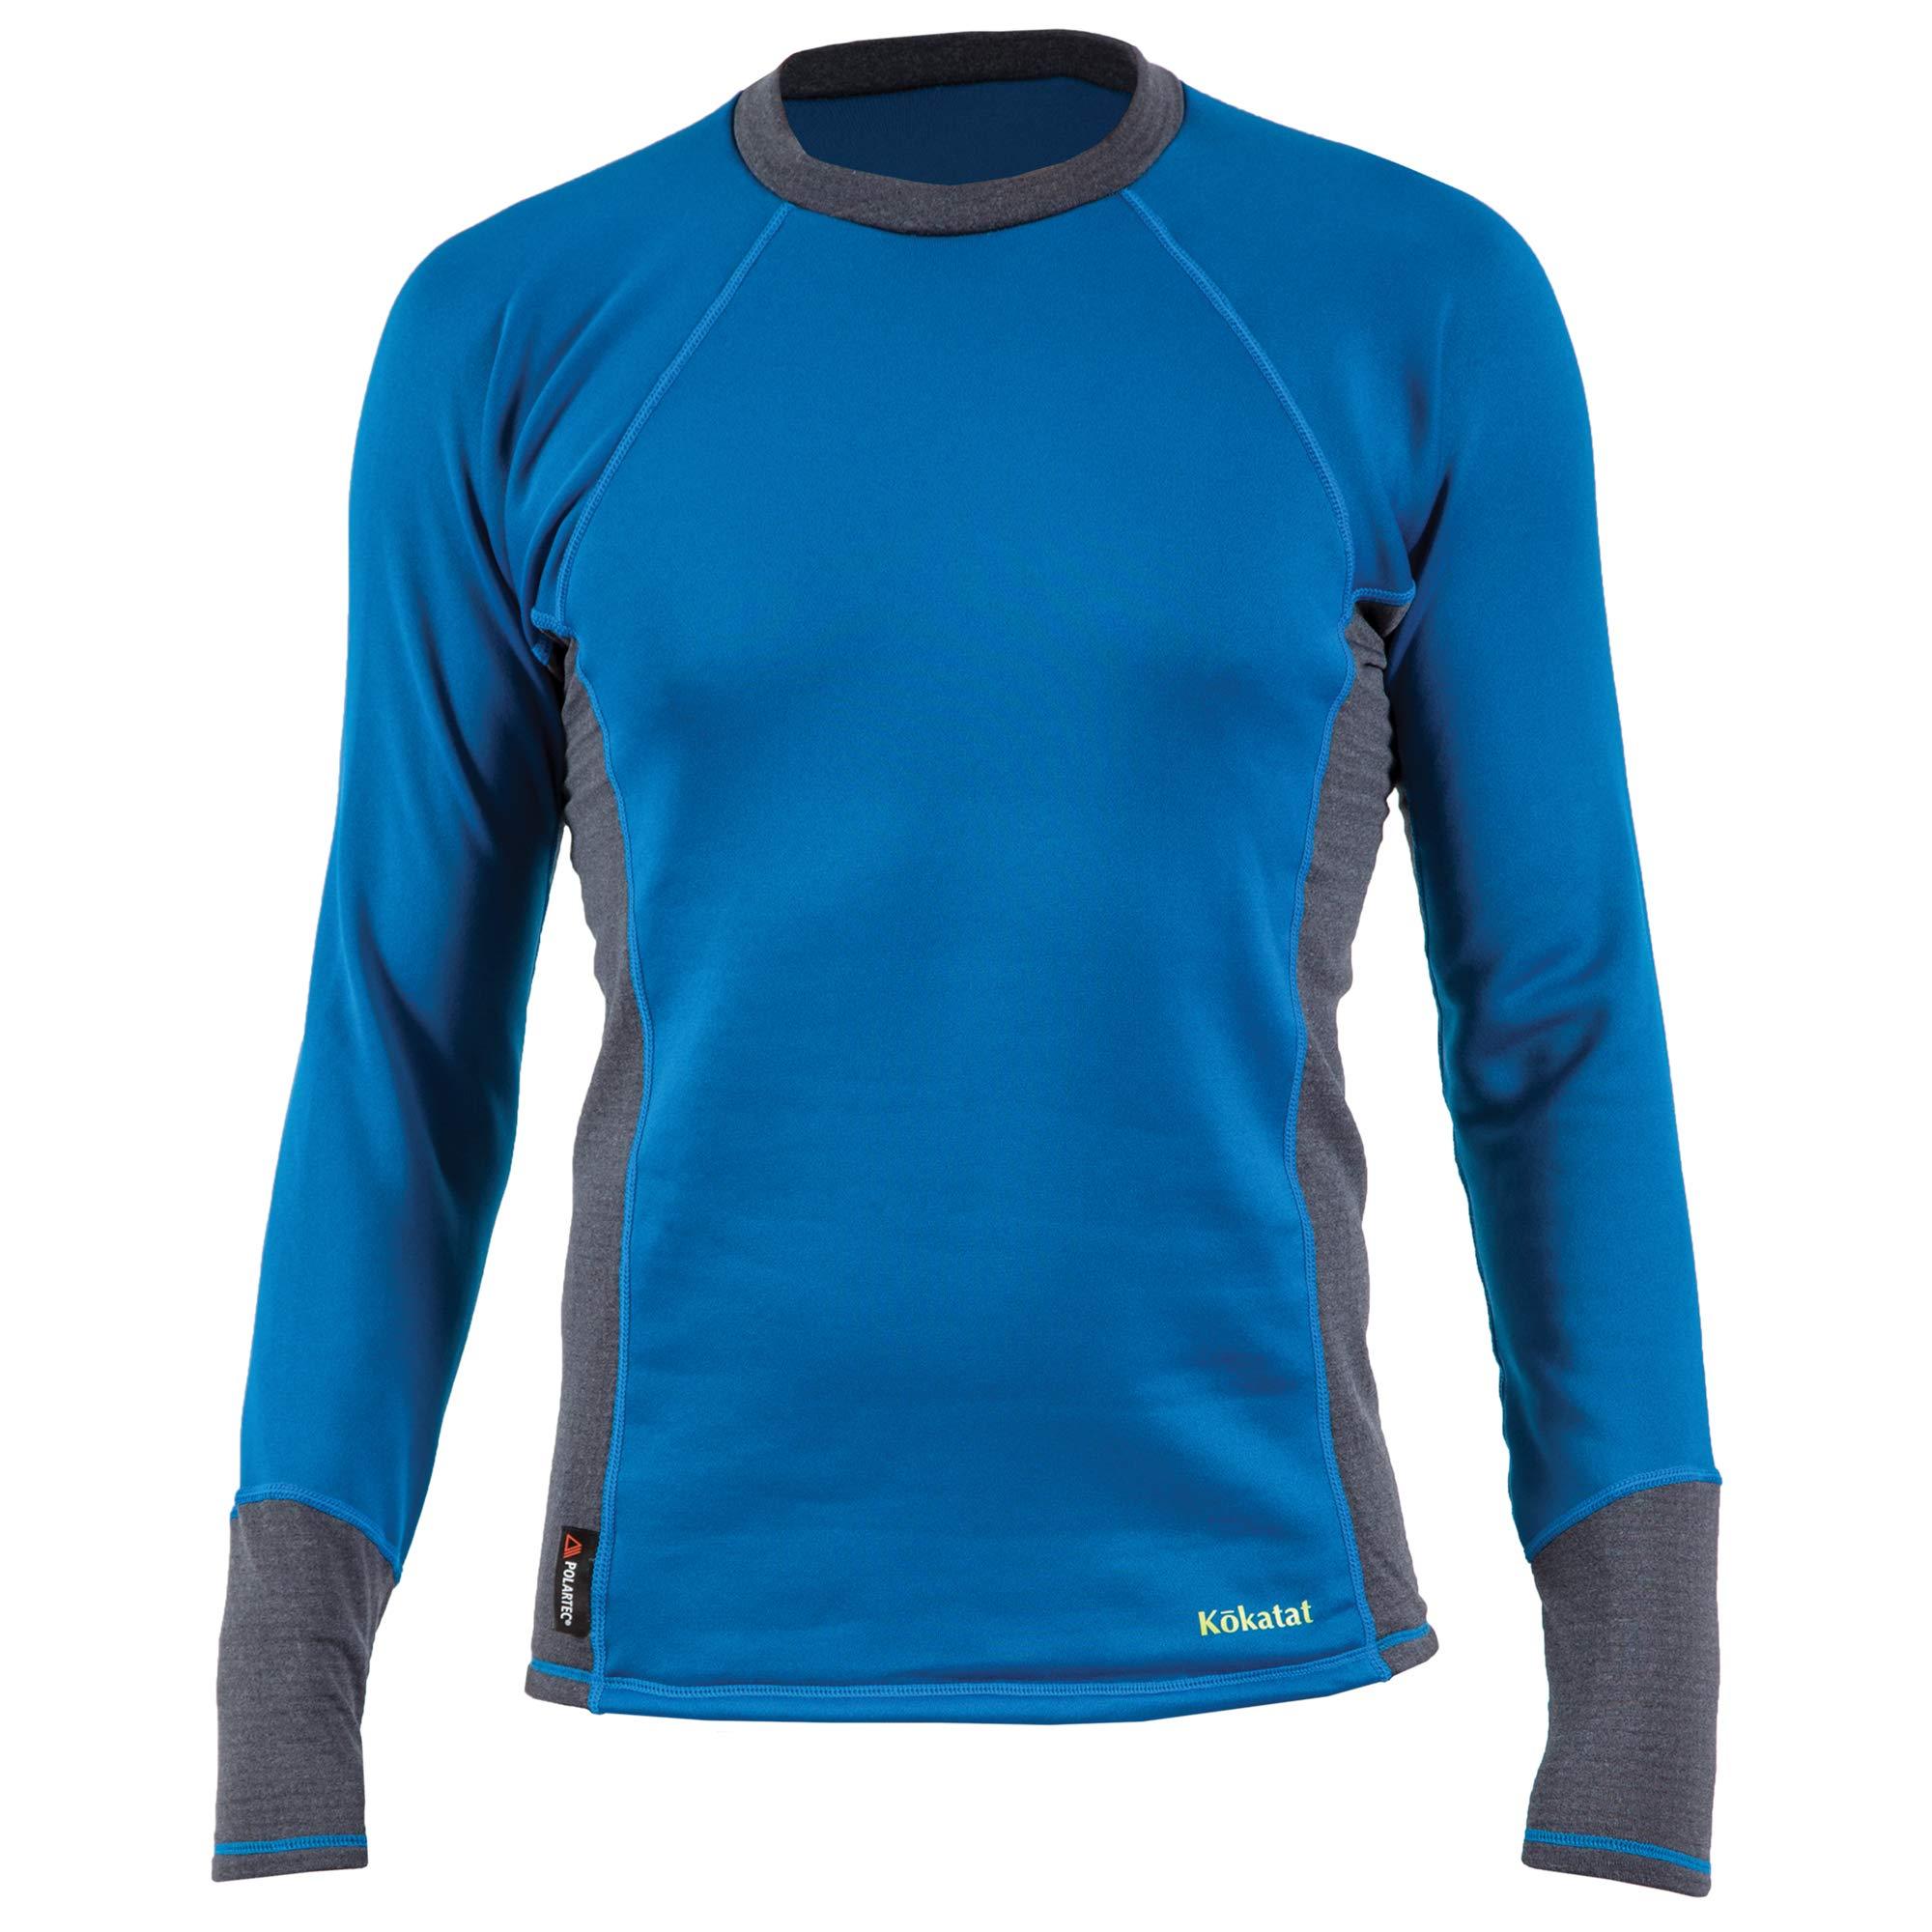 Kokatat Men's Polartec Power Dry Outercore Long Sleeve Shirt-Ocean-L by Kokatat